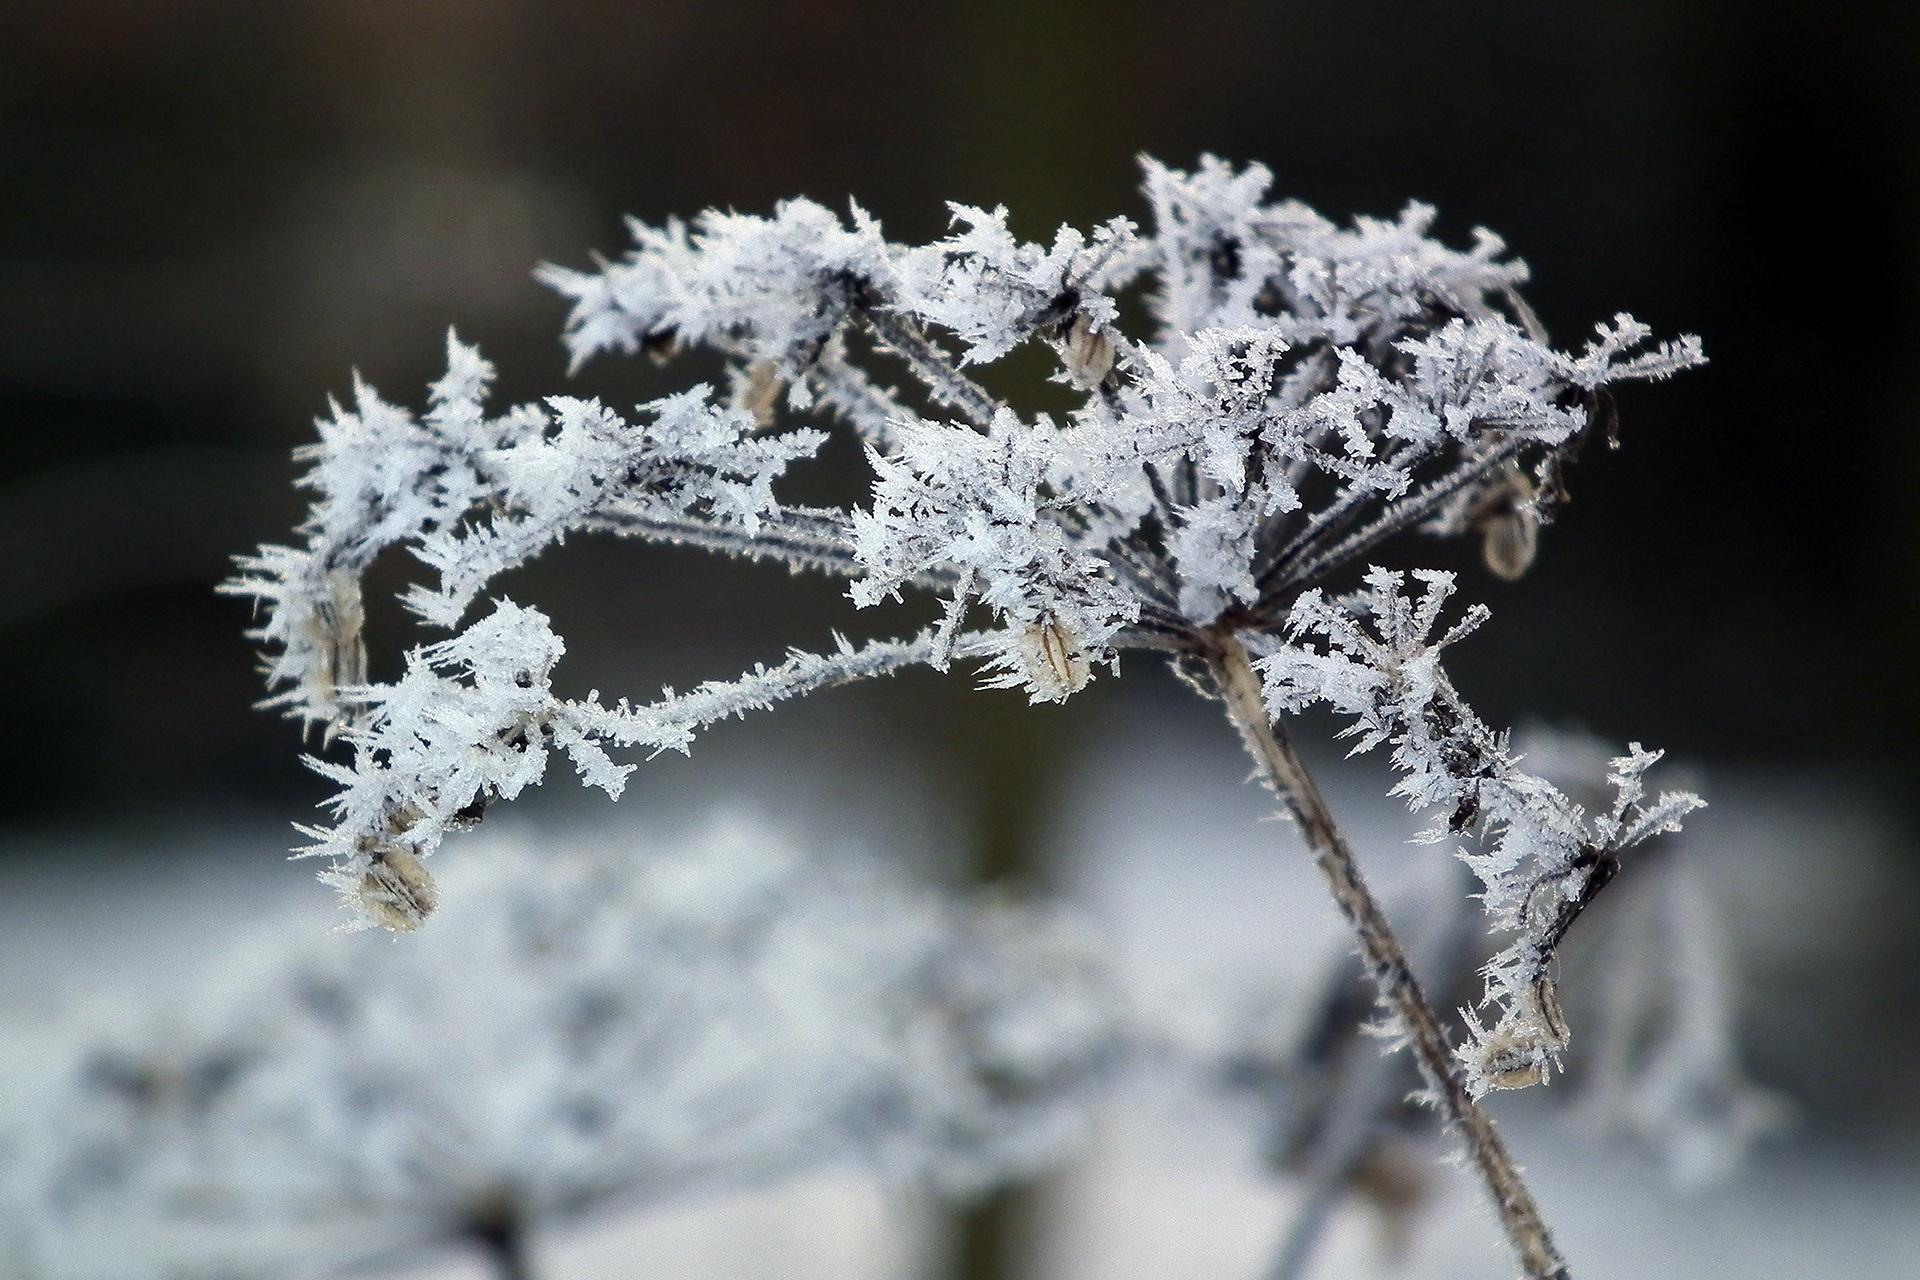 Gambar Cabang Salju Musim Dingin Embun Beku Es Ranting